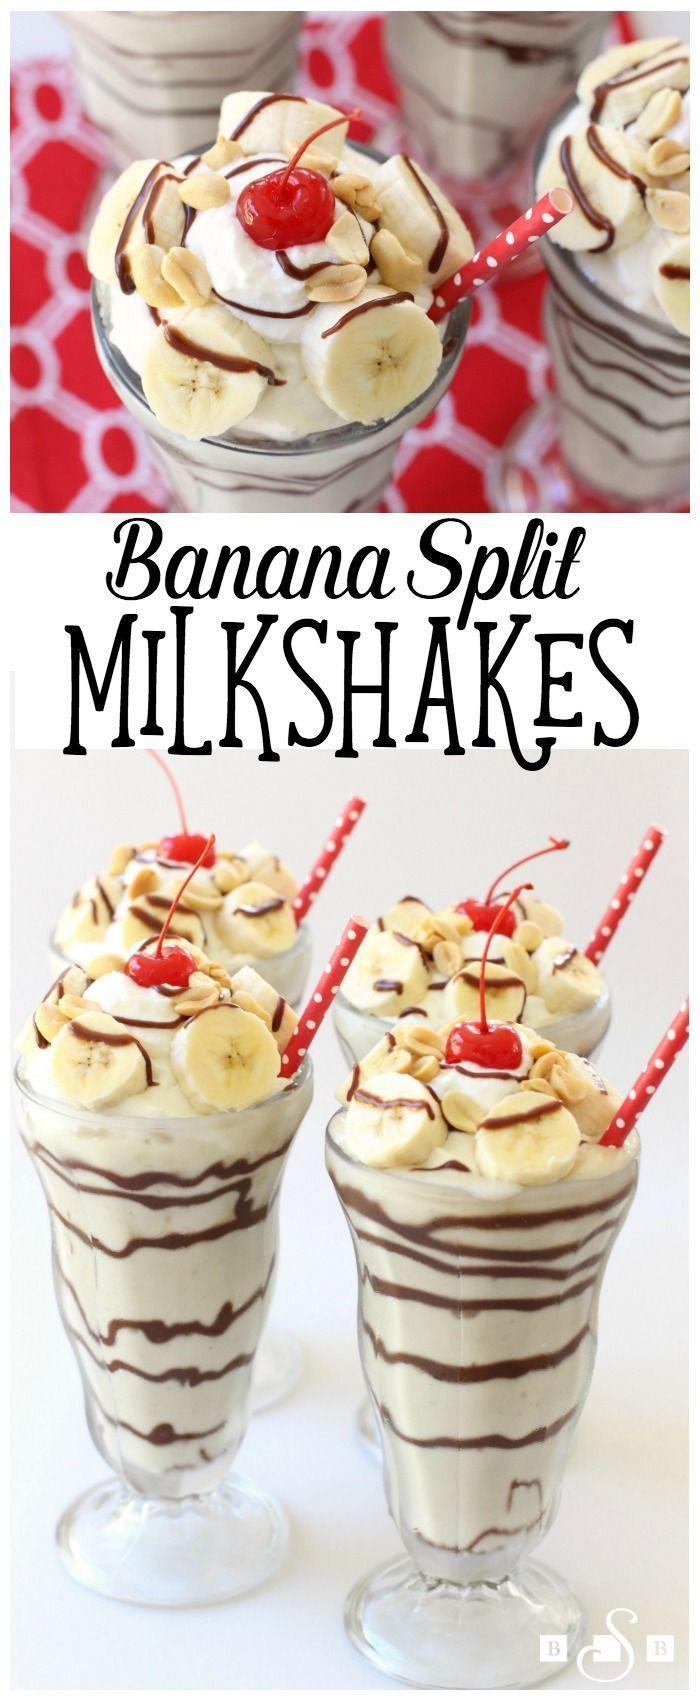 Nice Images Collection: Banana Split Desktop Wallpapers